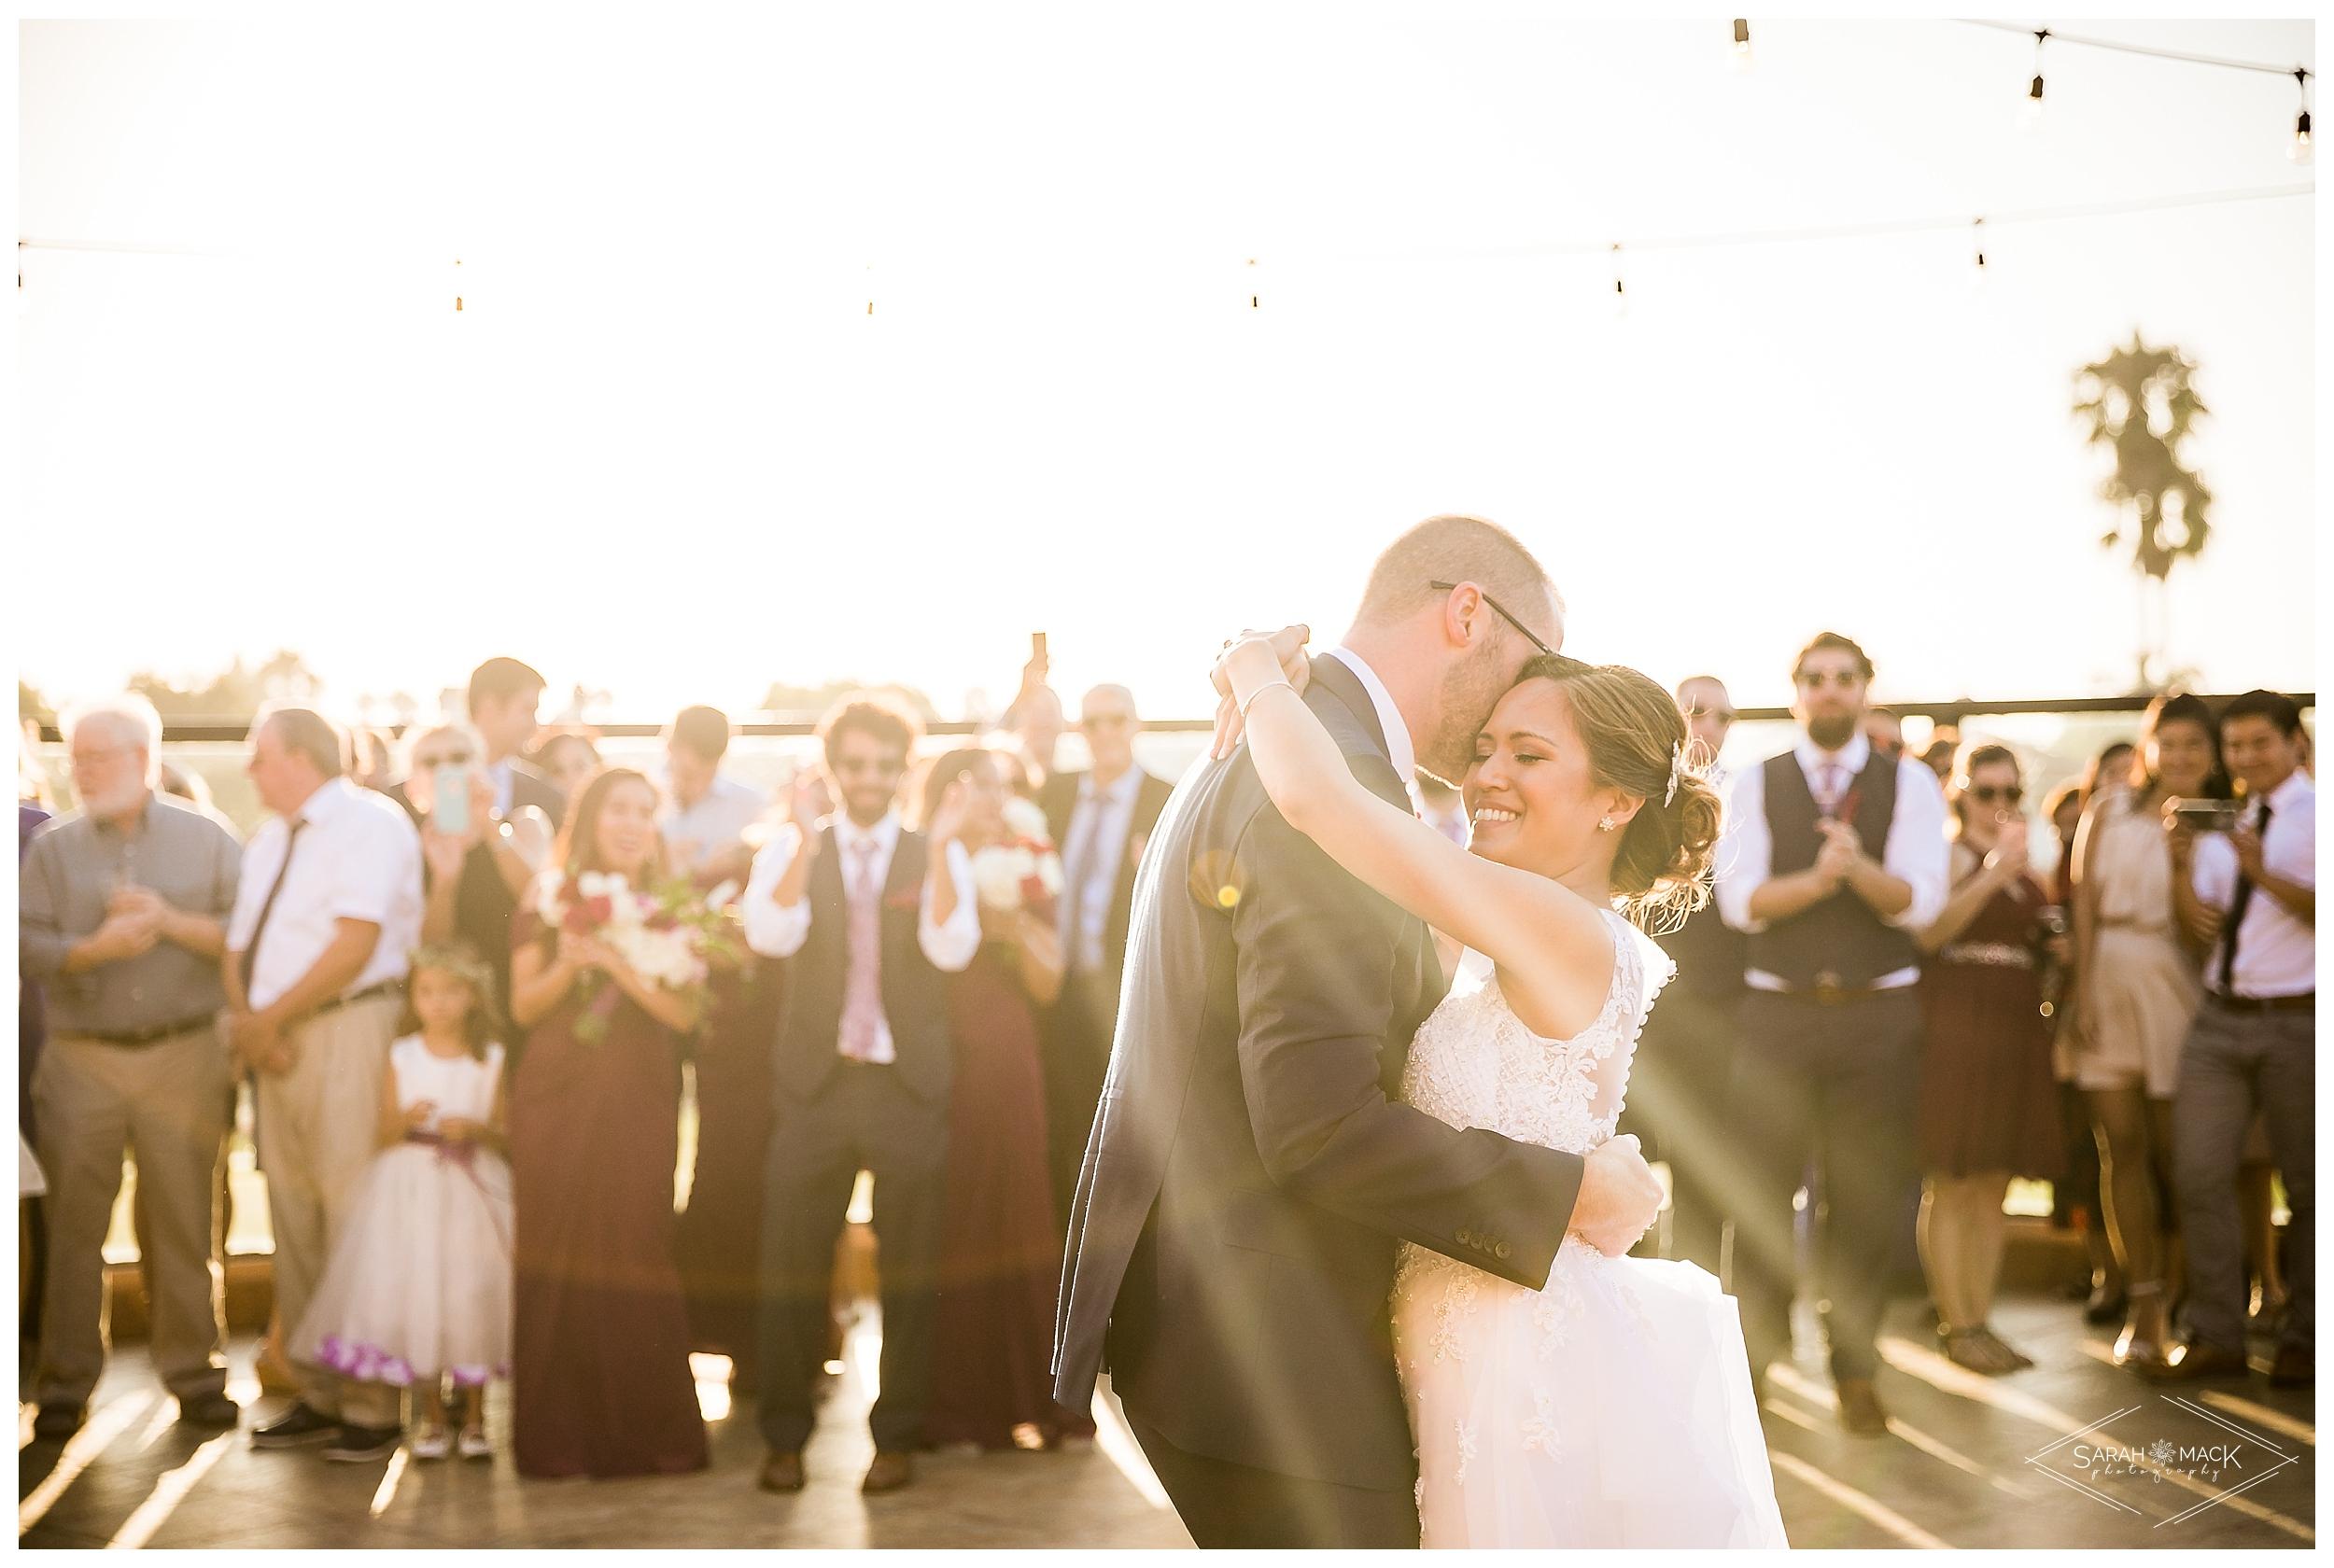 MR-Sea-Cliffe-Country-Club-Huntington-Beach-Wedding-0138.jpg